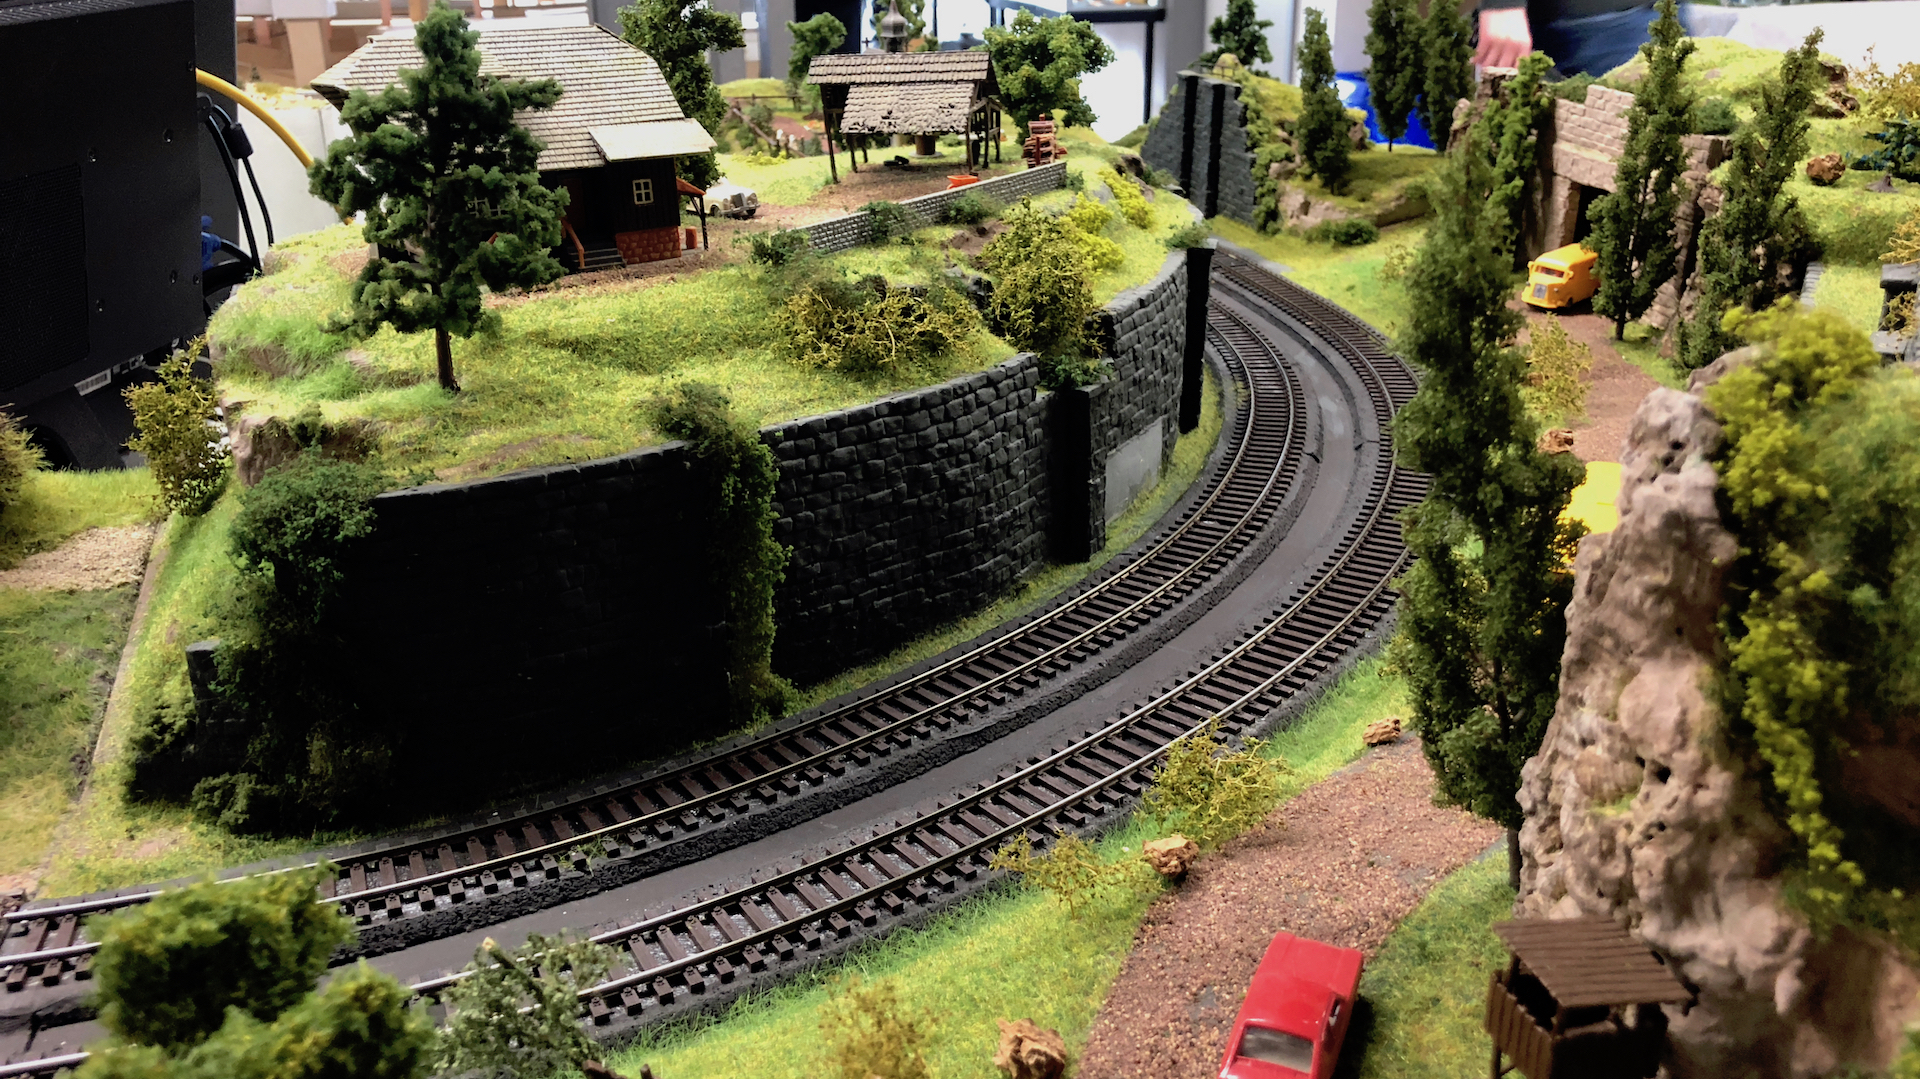 18_02_24_Schautag-Eisenbahnfreunde-Hameln_027